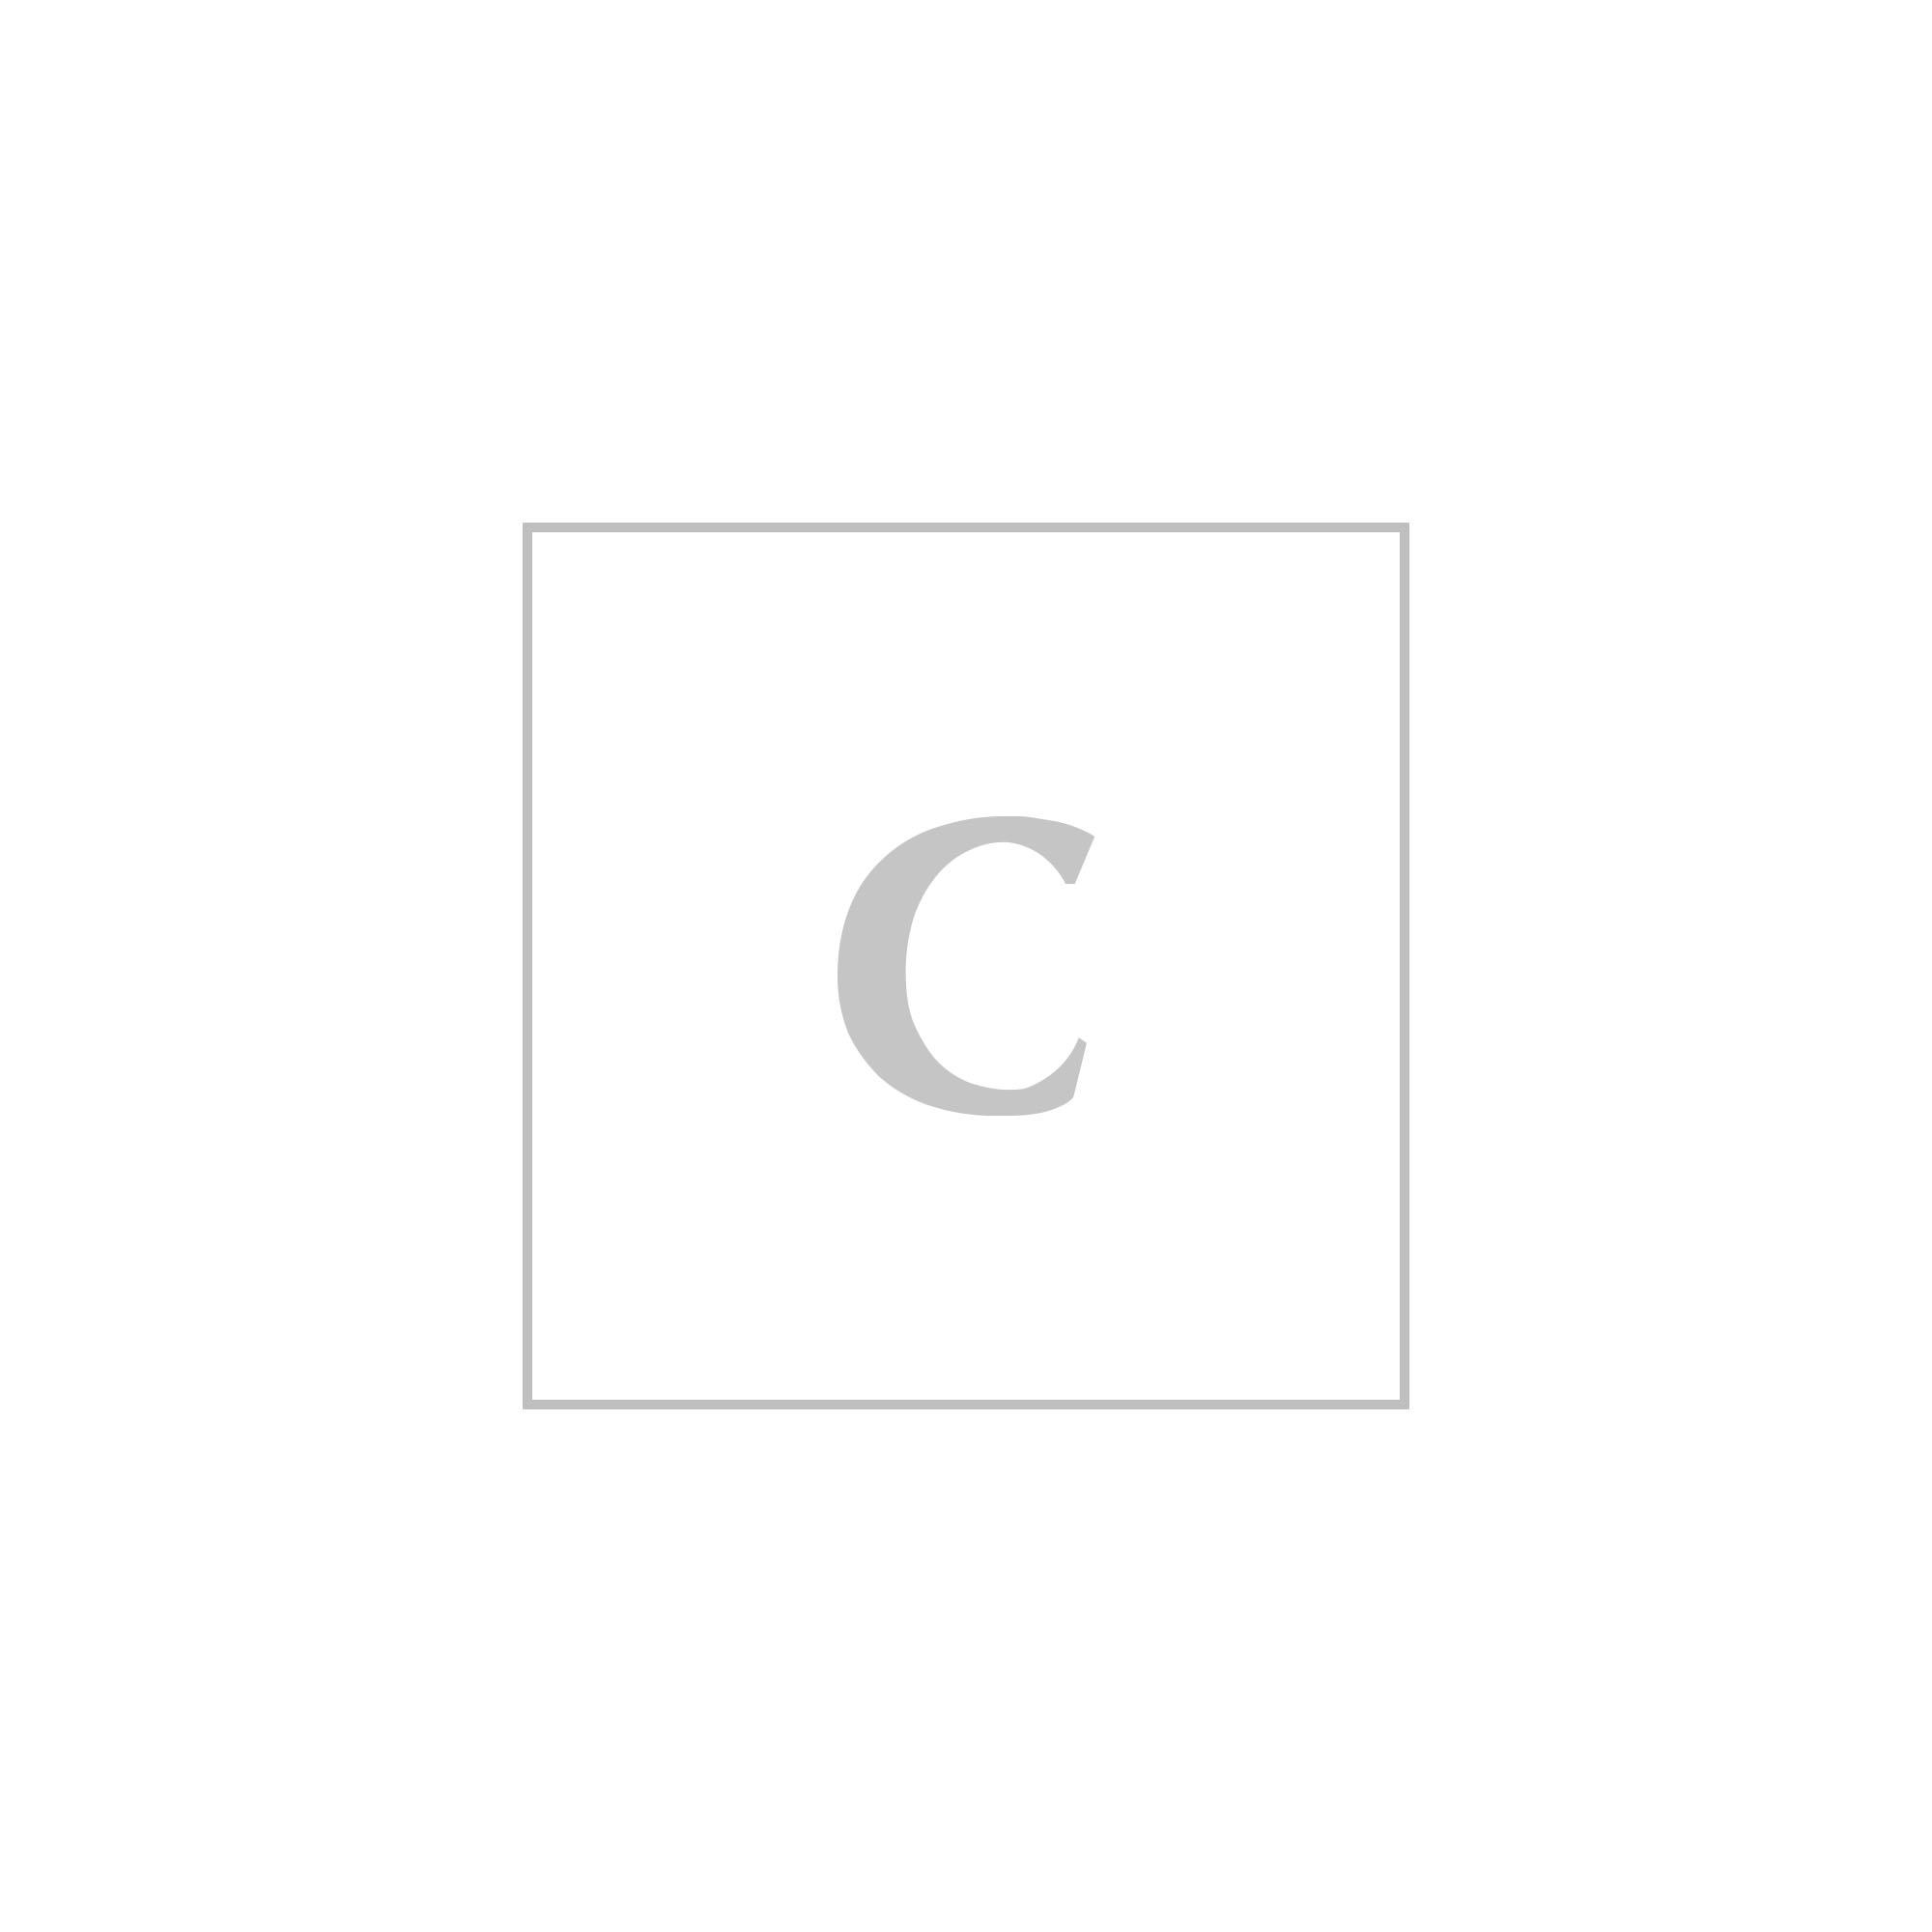 Dolce   gabbana sneaker portofino stampa logo ... 0b3eada9575